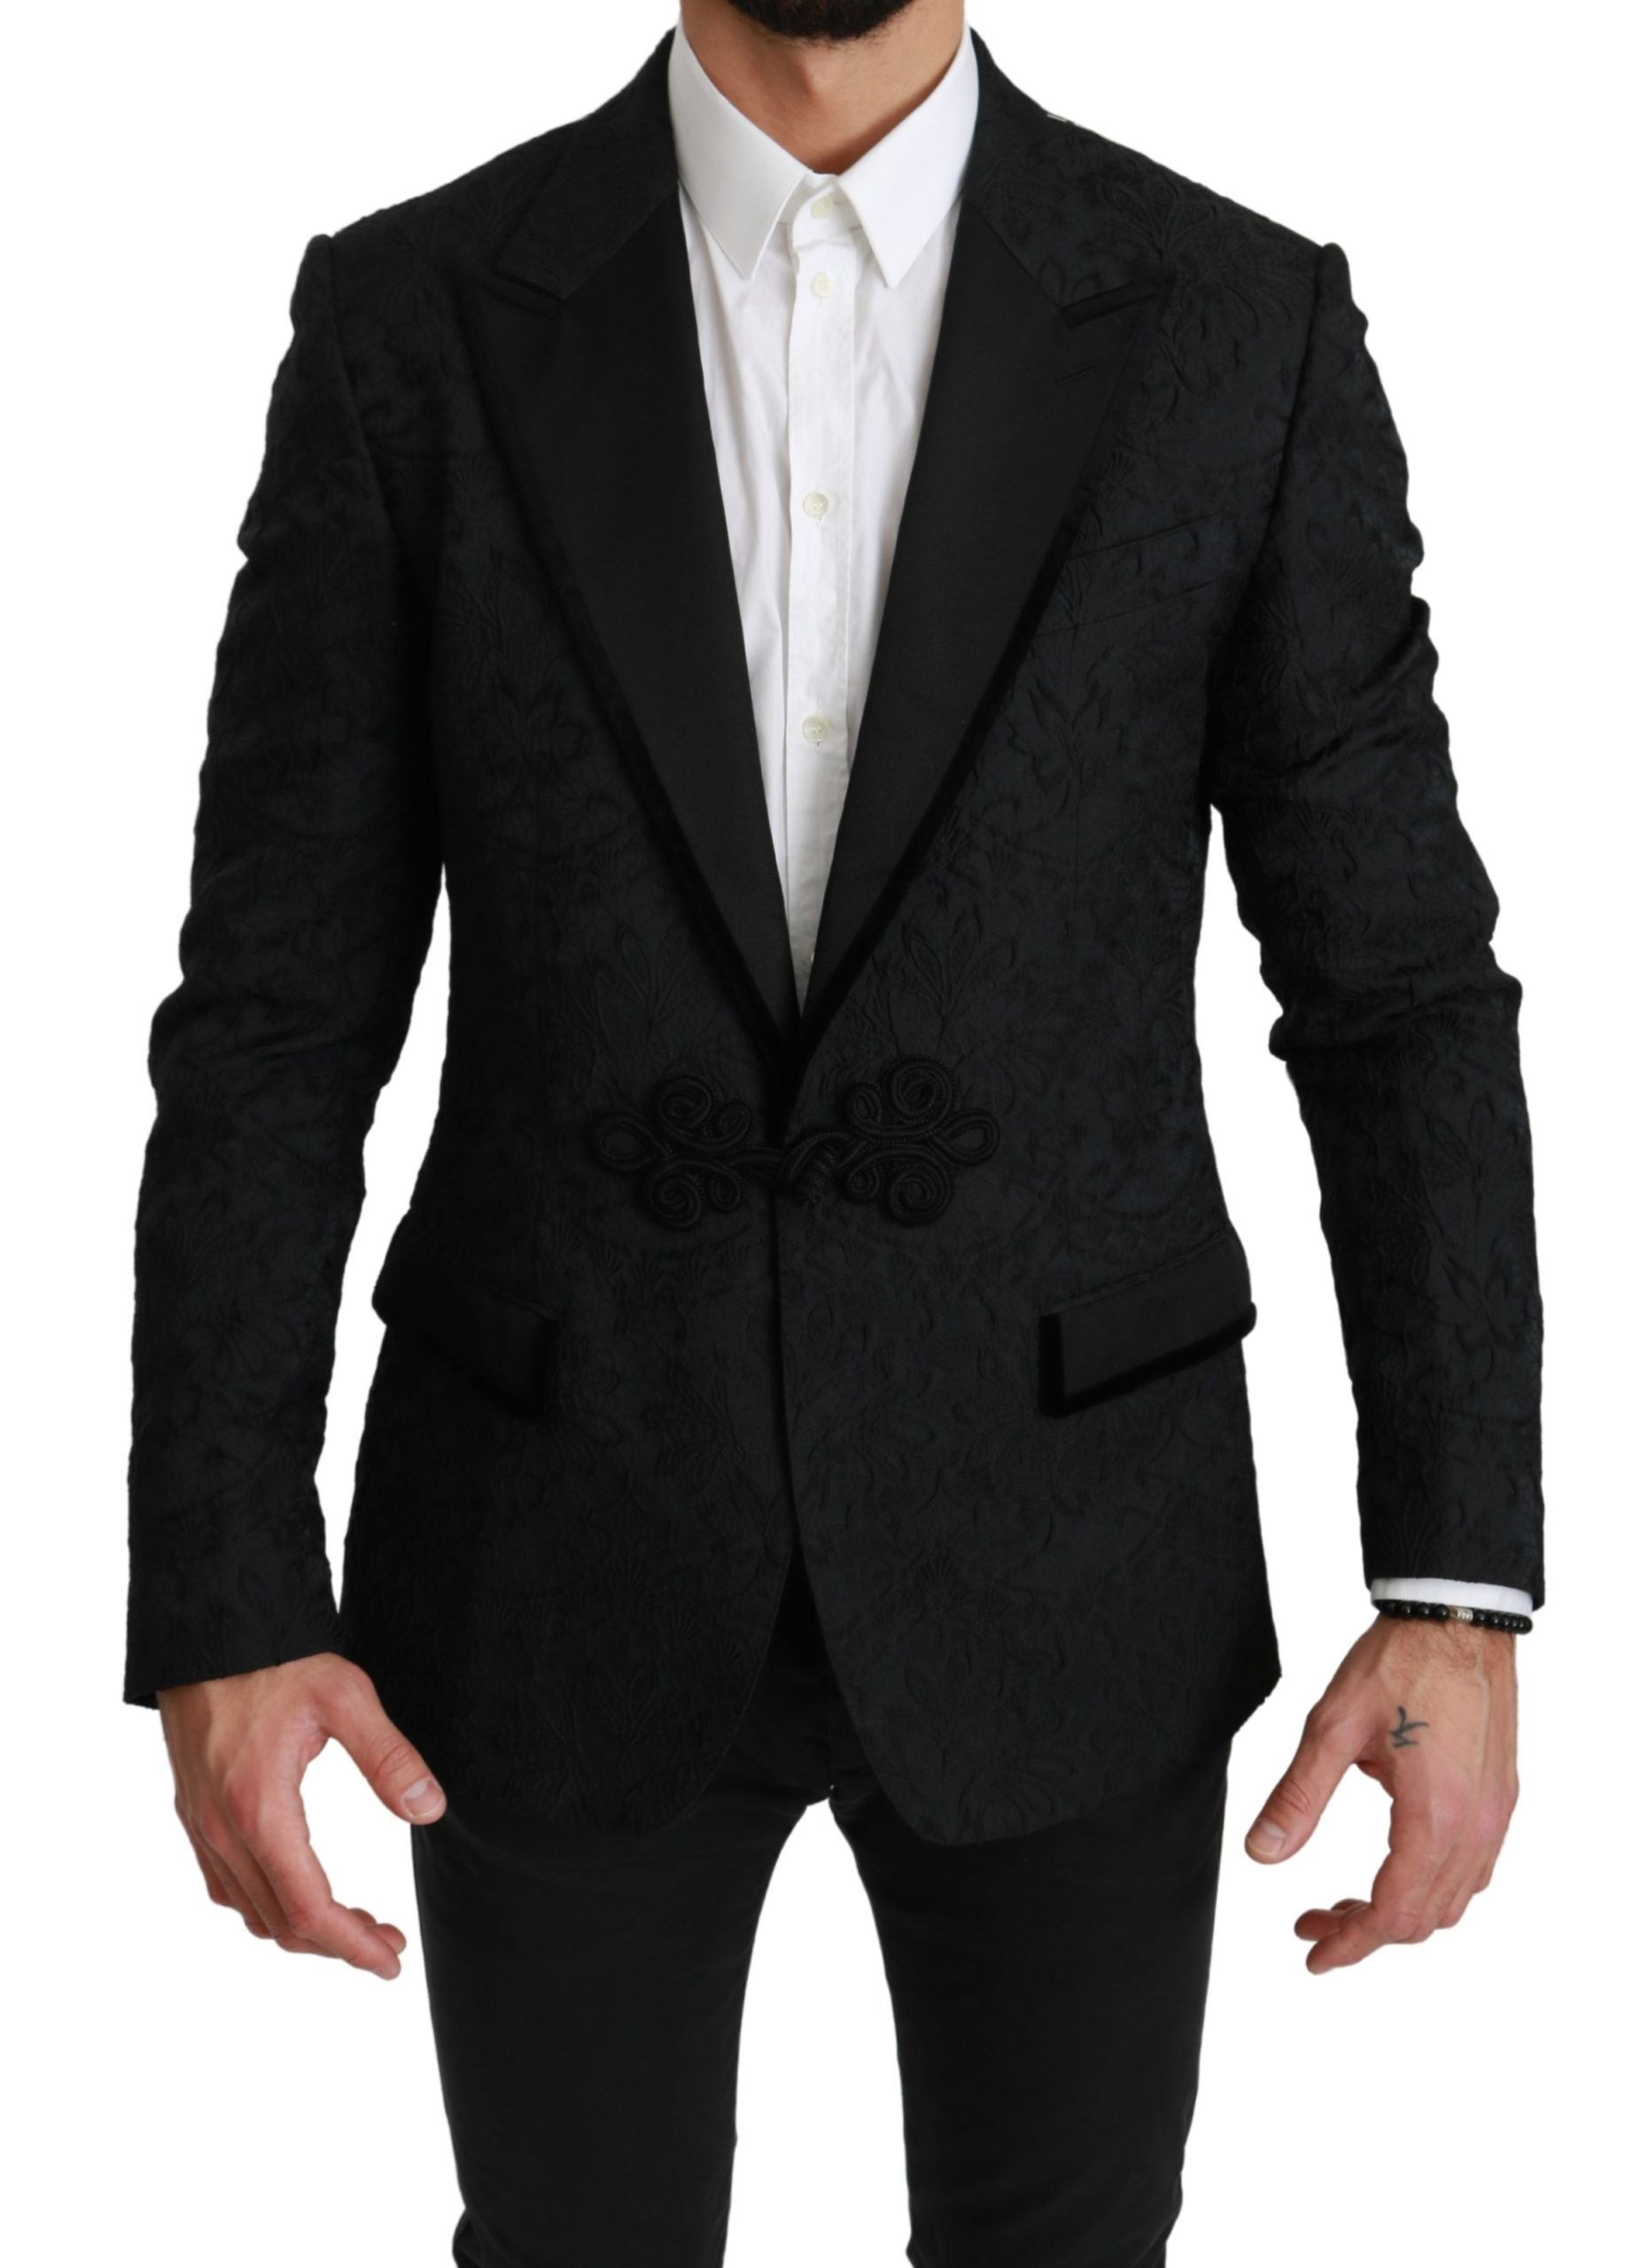 Dolce & Gabbana Men's Jacquard TORERO Lace Blazer Black JKT2533 - IT50 | L